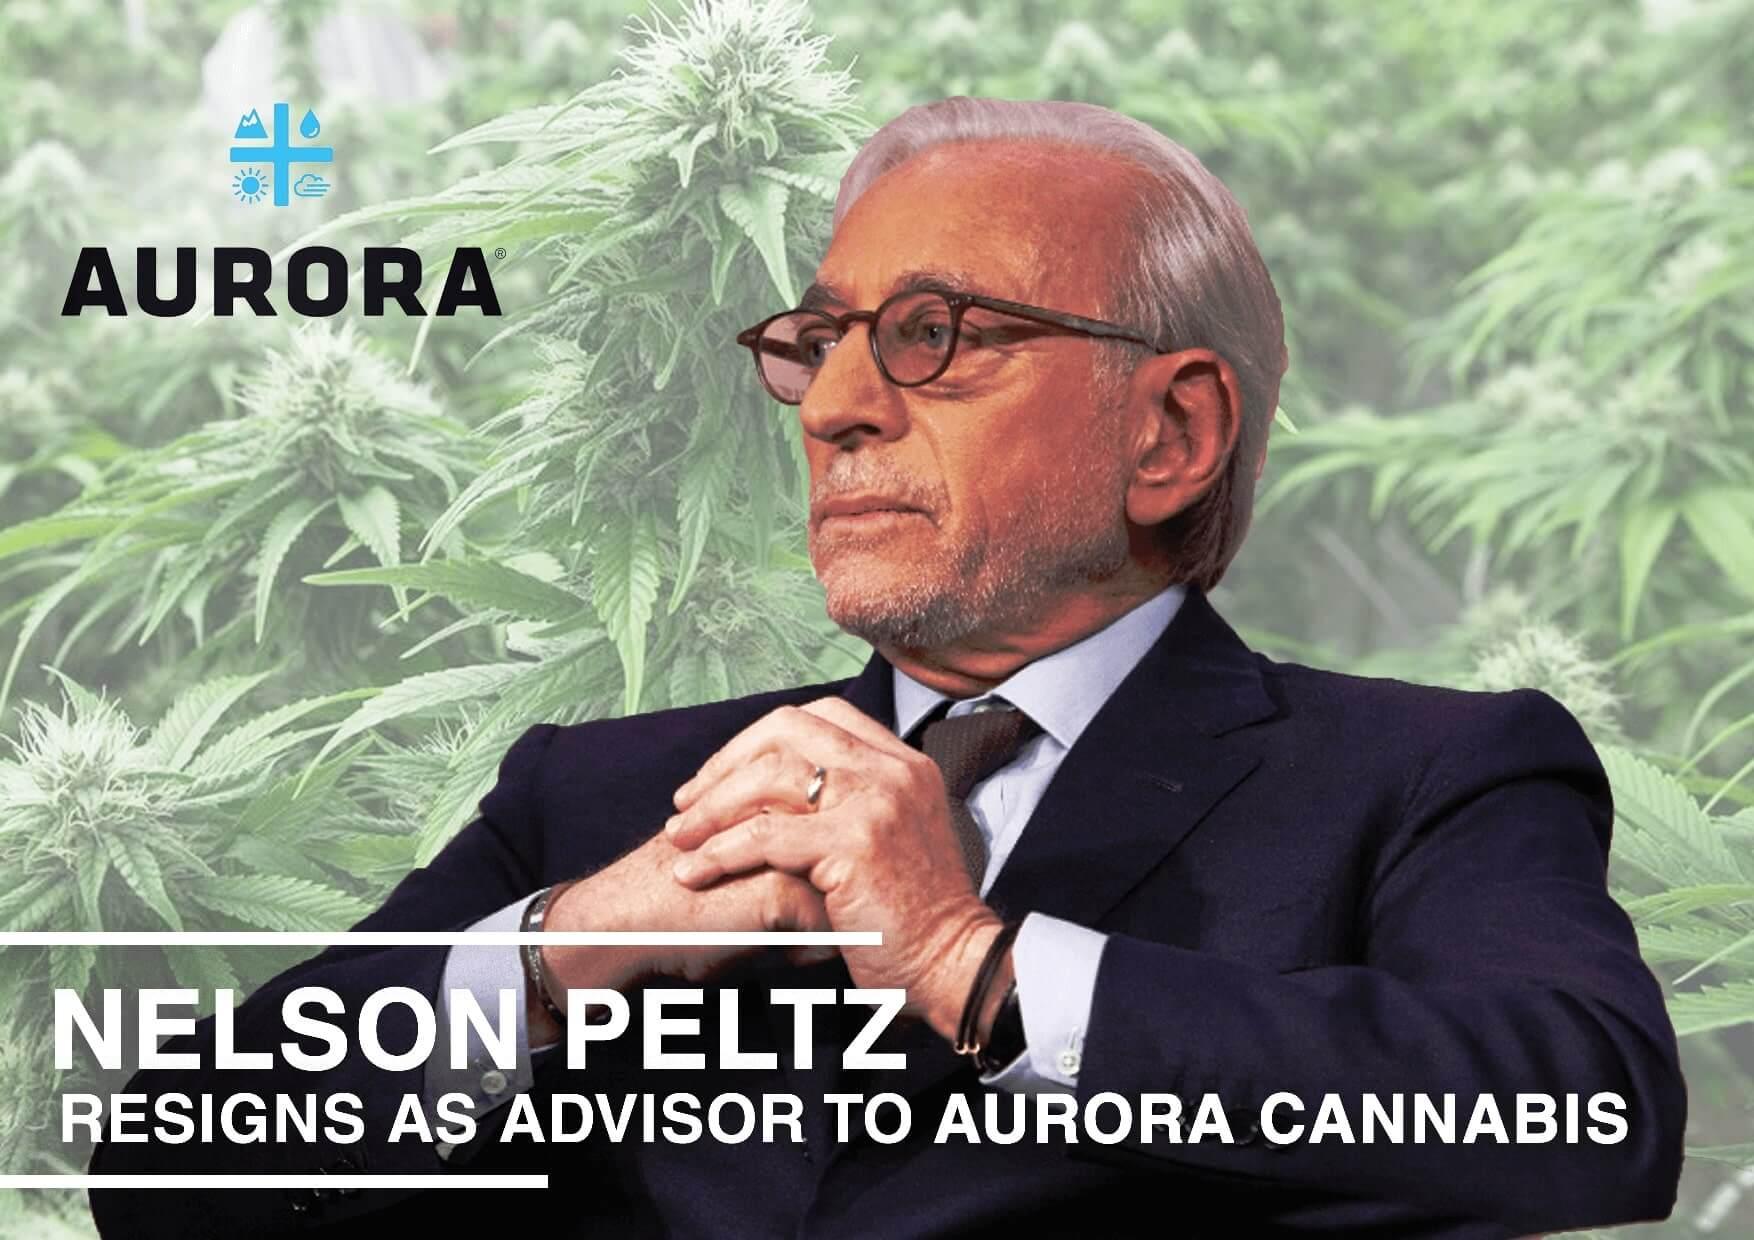 Nelson Peltz, Billionaire Investor, Resigns as Advisor to Aurora Cannabis